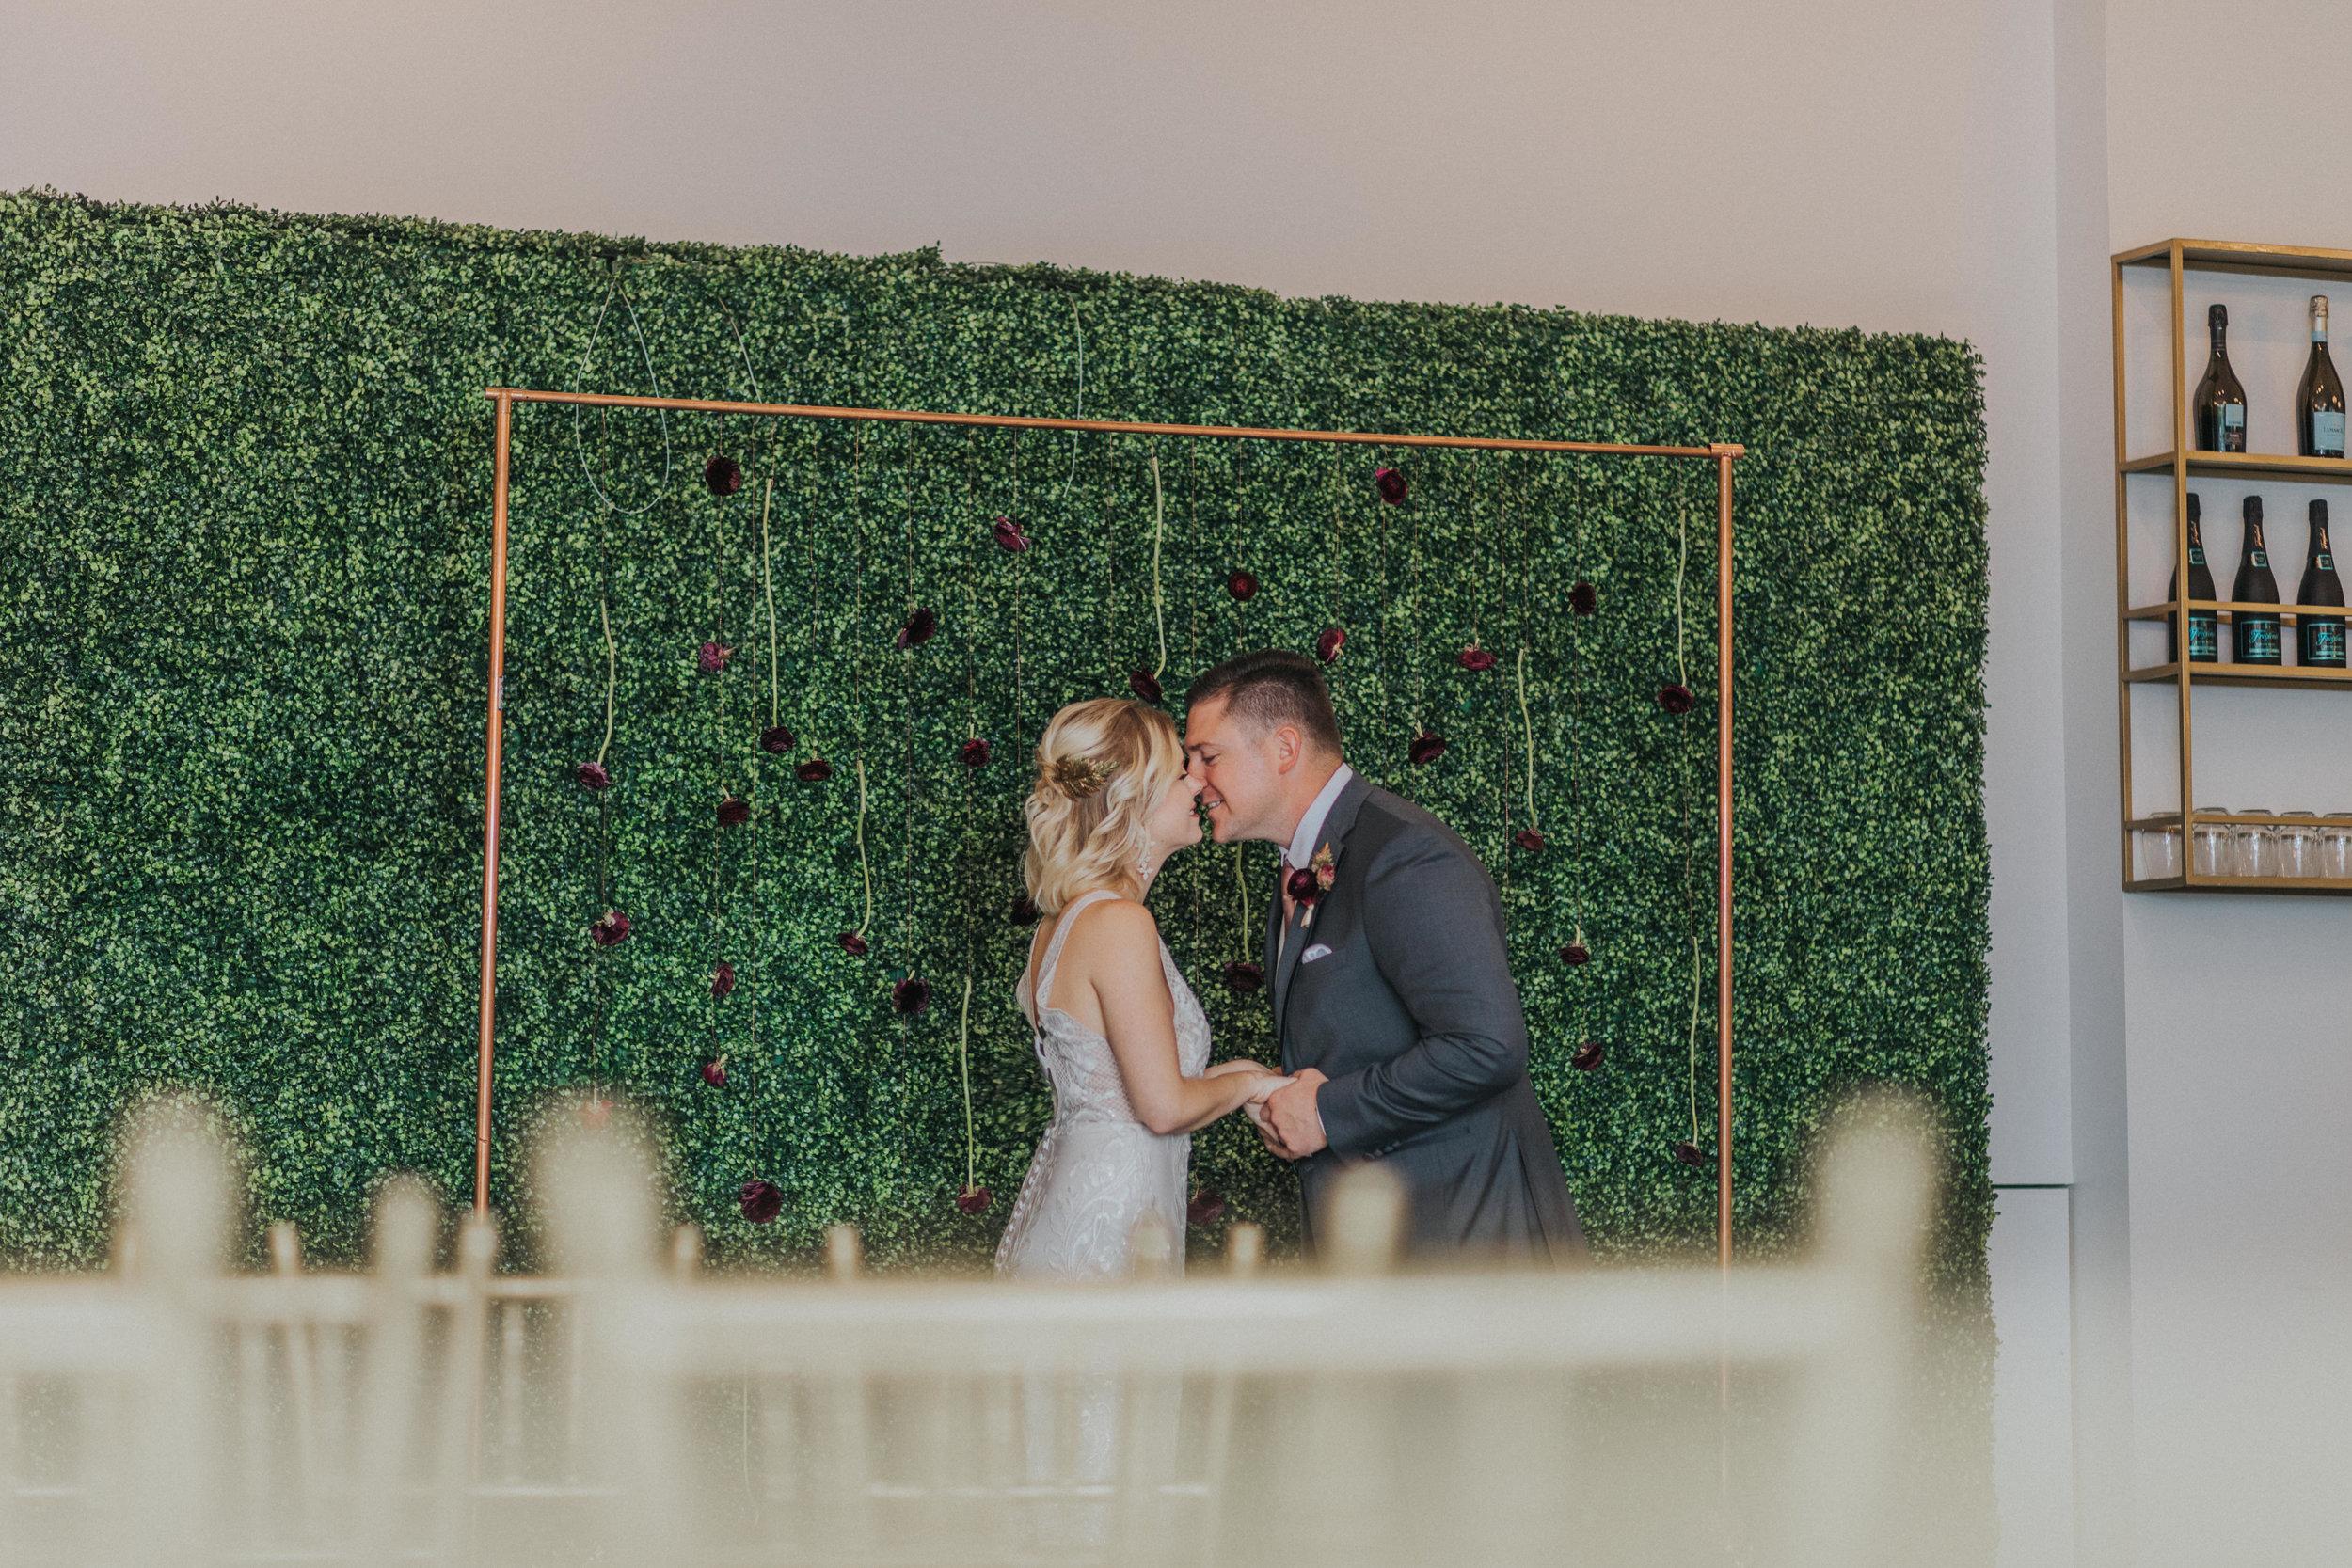 125 tiny-luxe-weddings-omaha-nebraska-midwest-empire-room.jpg